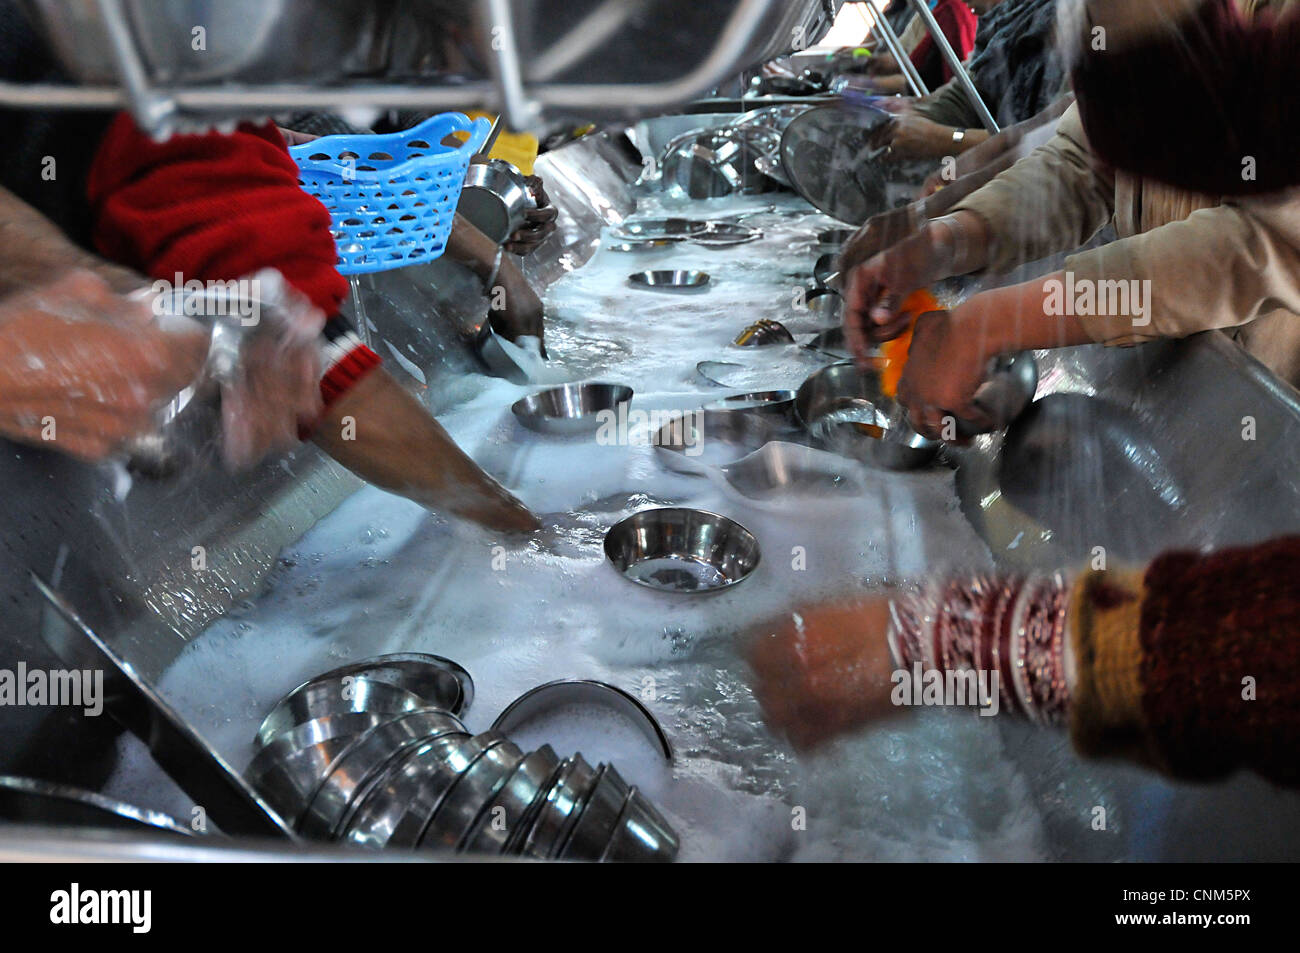 Asia India Punjab o Templo de Oro de Amritsar Hari Mandir voluntarios lavan miles de platos cada día Imagen De Stock